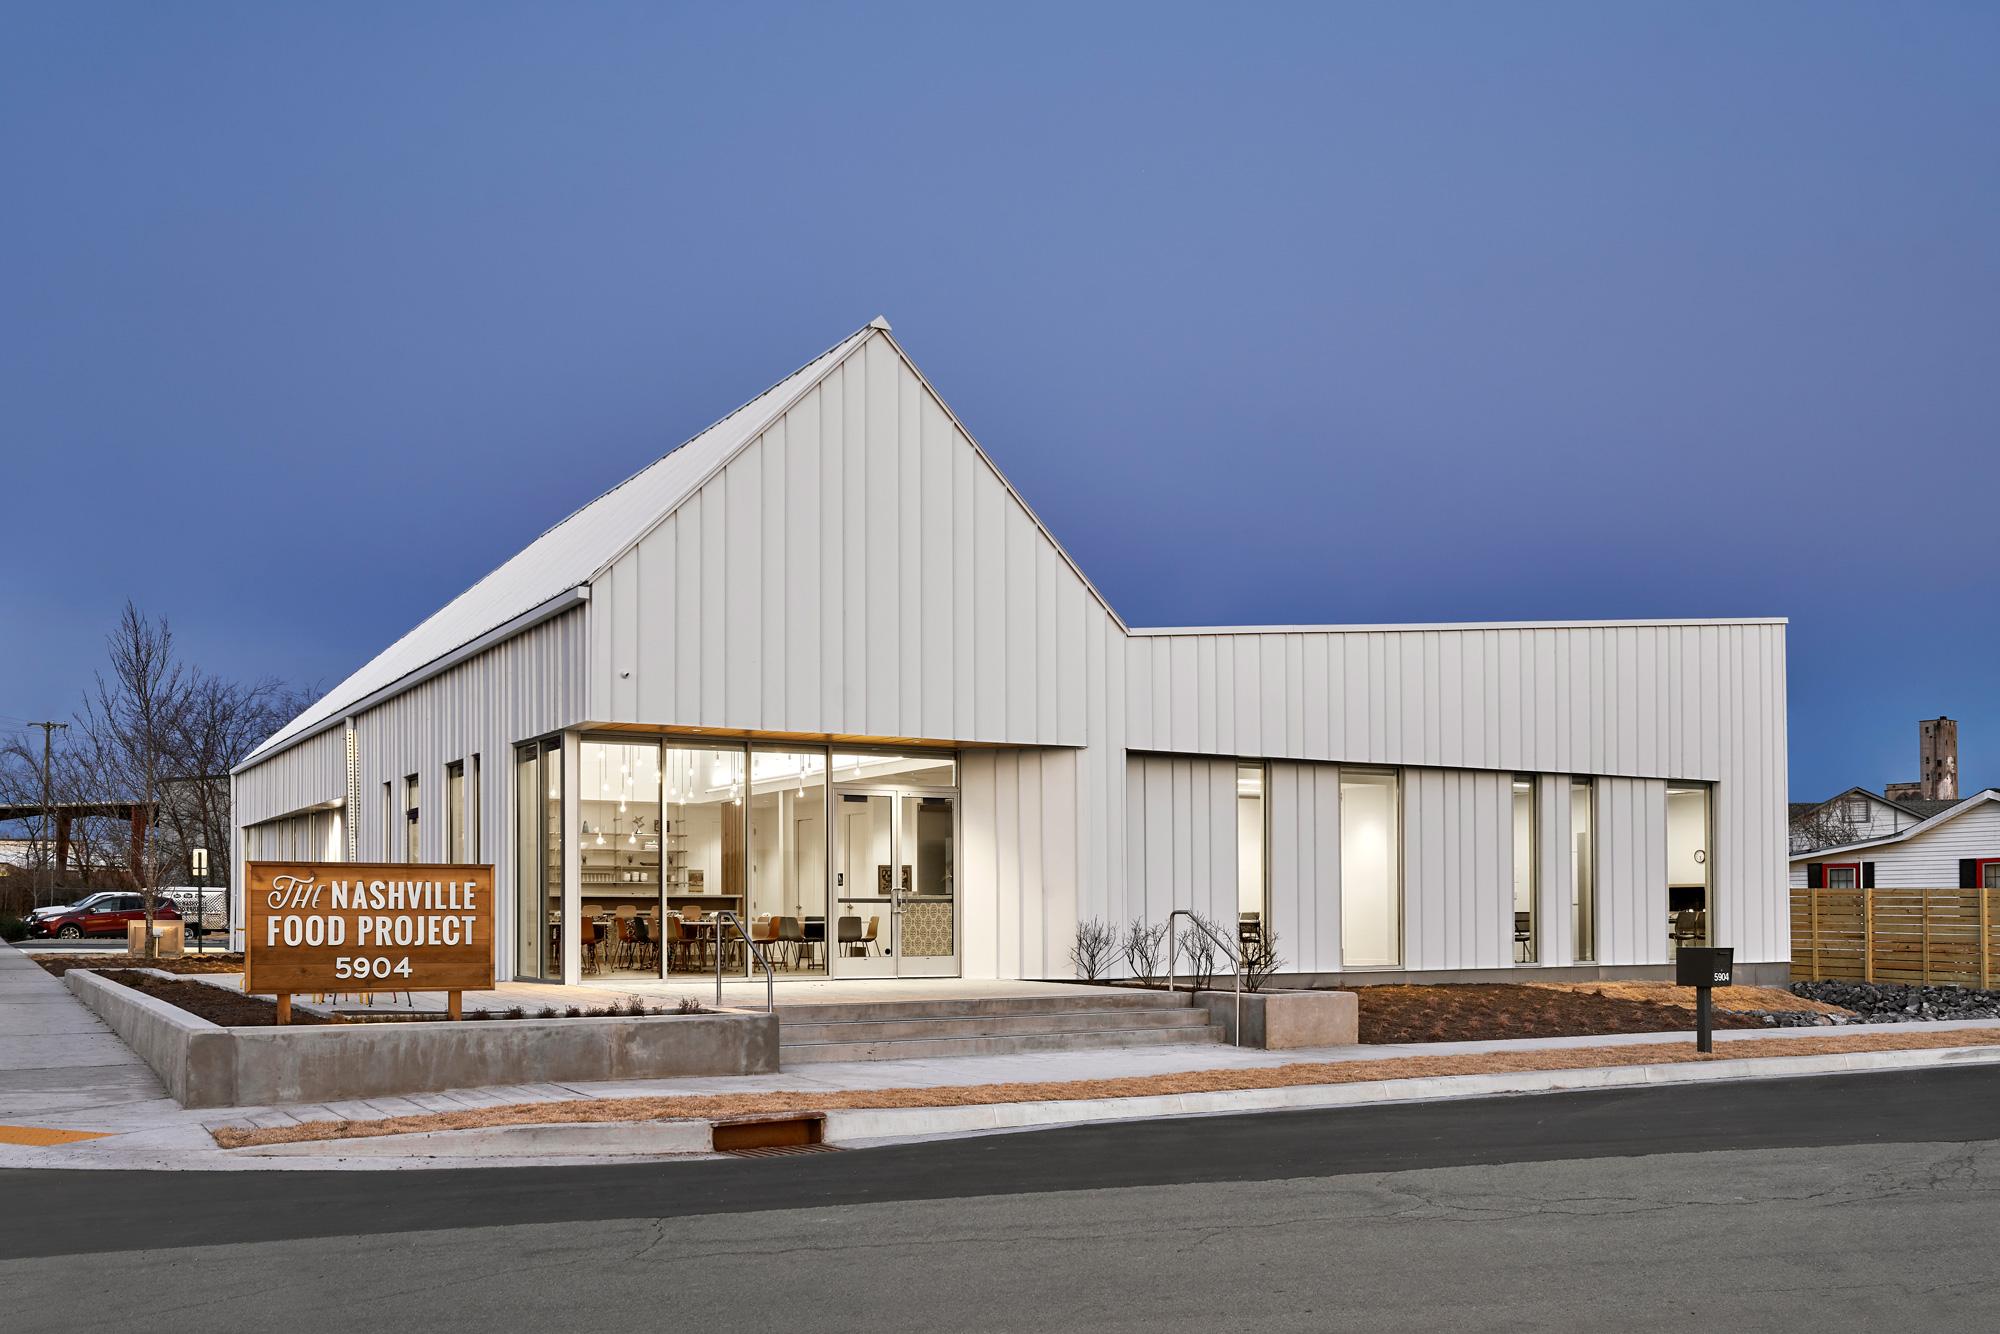 Architectural-Photograph-of-The-Nashville-Food-Project-in-Nashville-Tennessee-by-Architectural-Photographer-Nick-McGinn-6.web.jpg